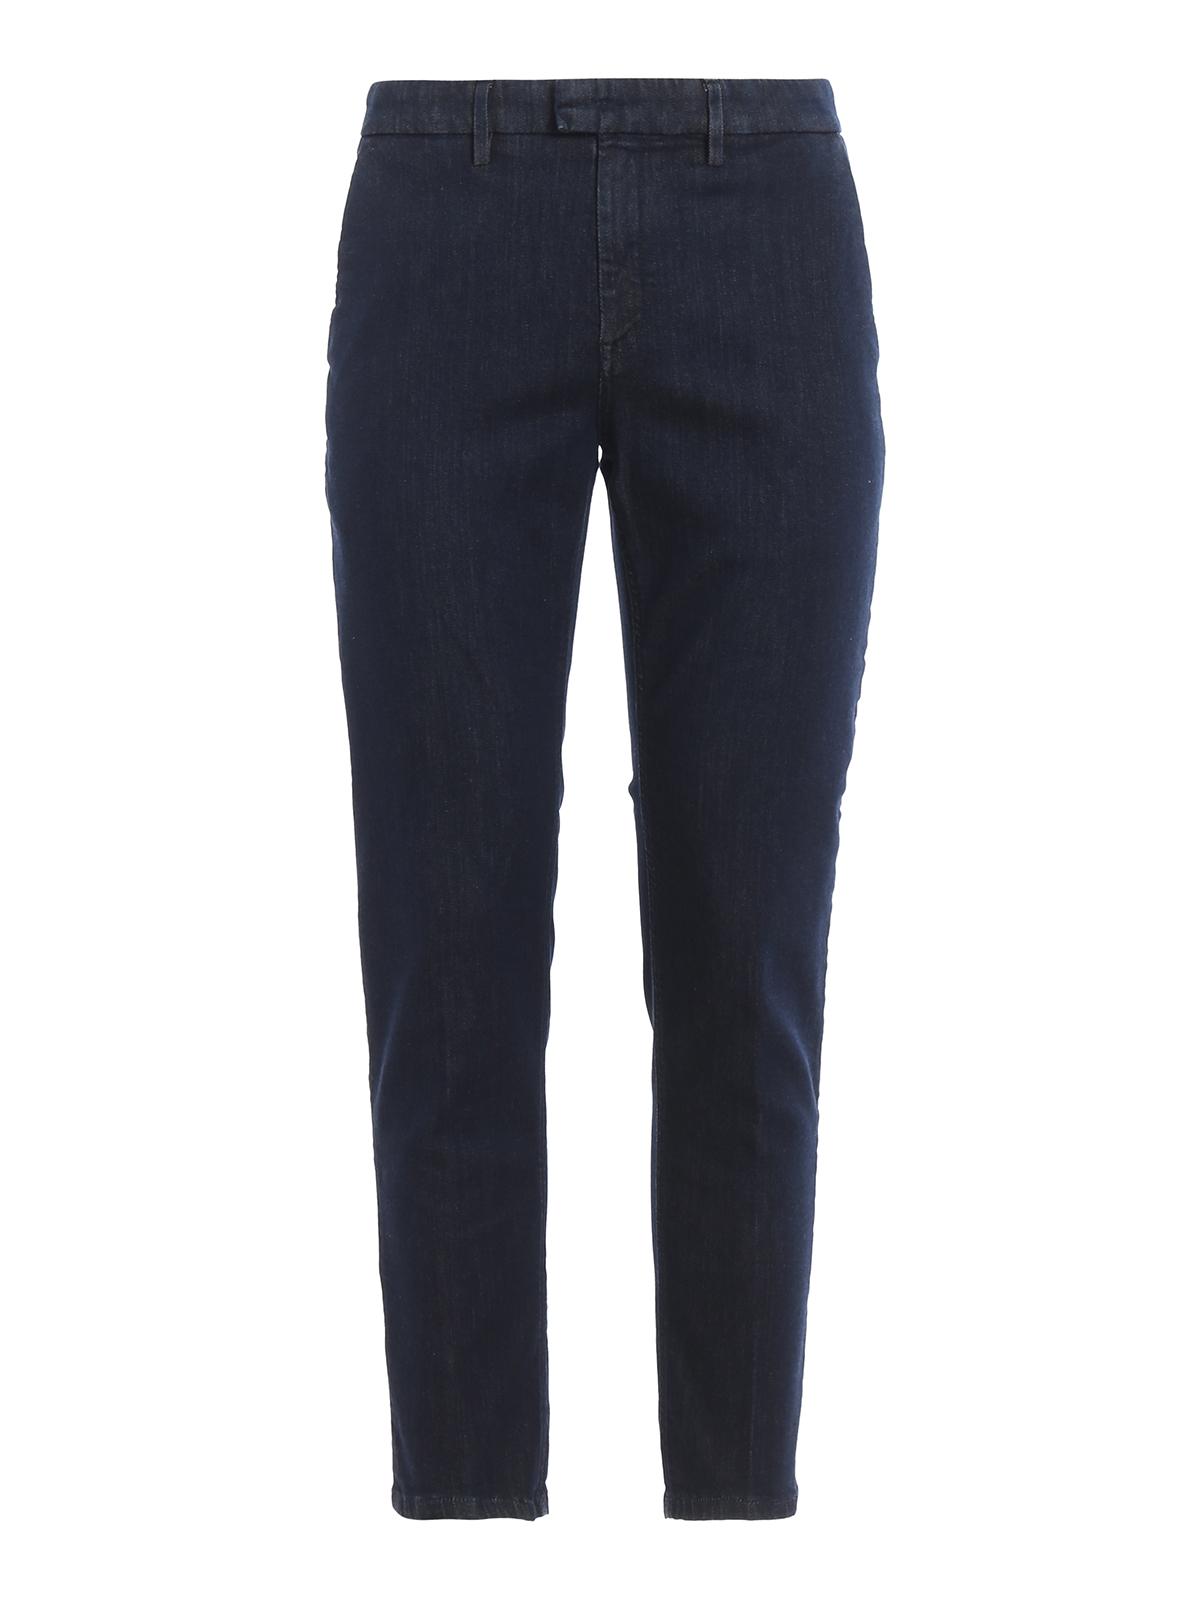 Dondup Pablo Soft Cotton Trousers In Dark Wash